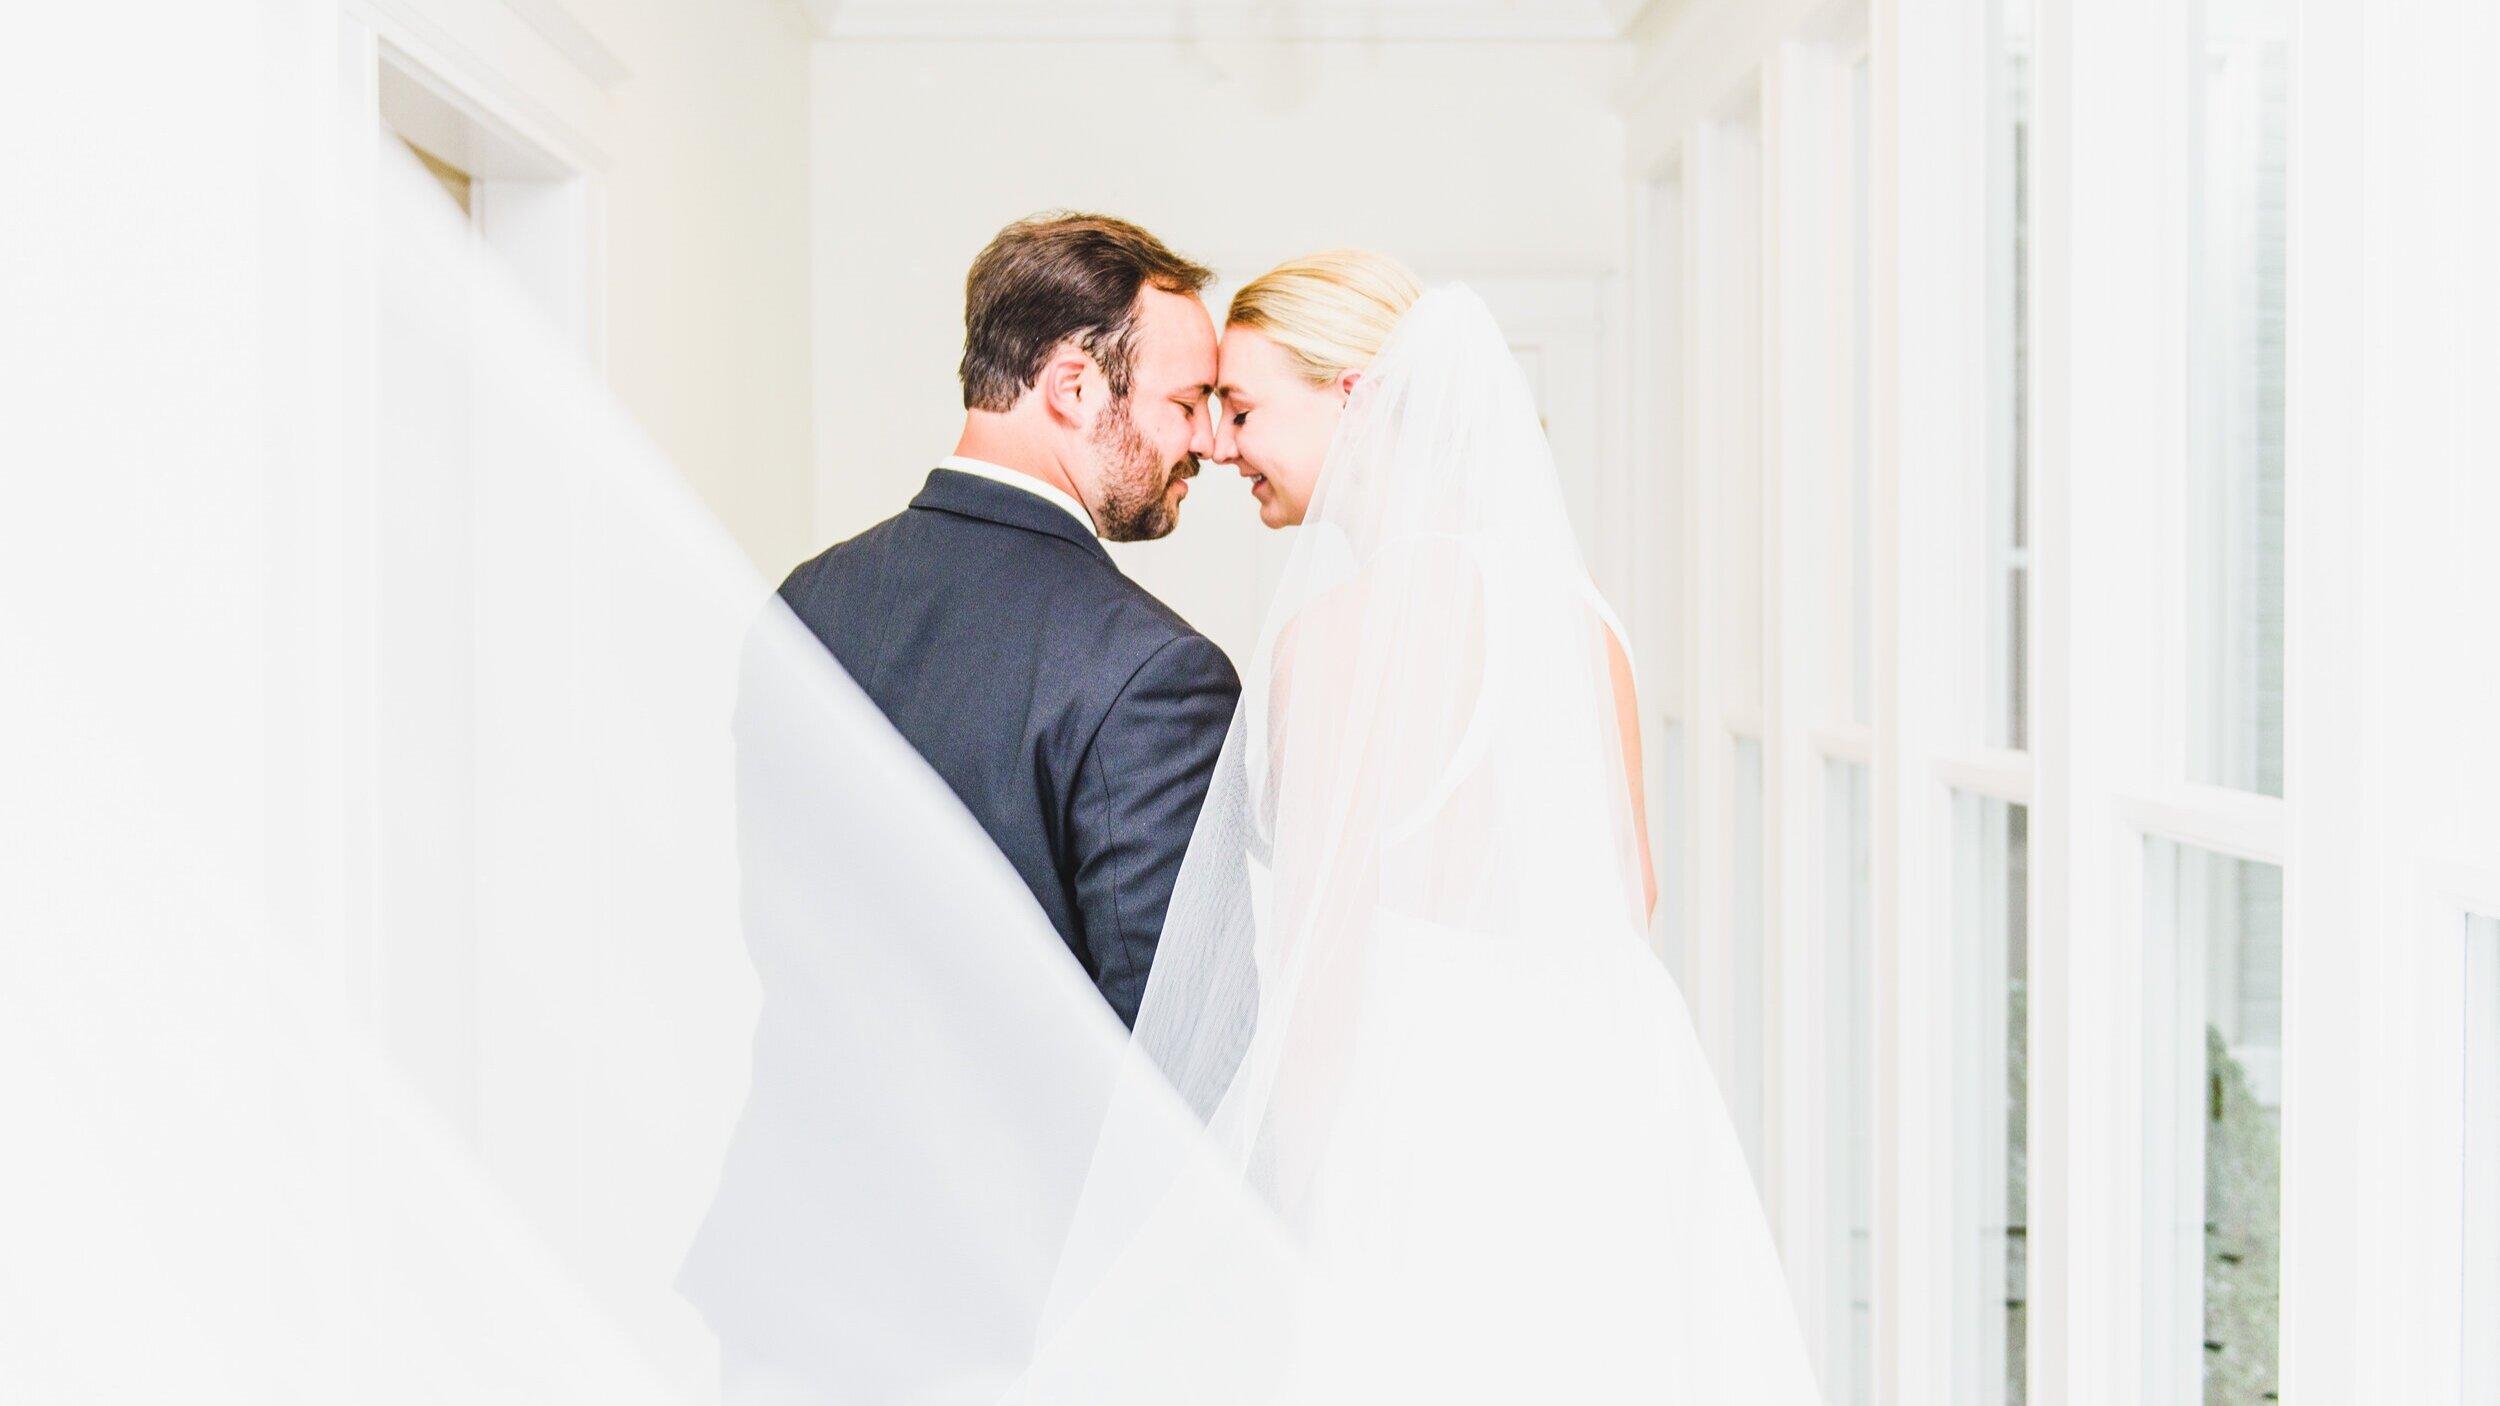 Destination+Wedding+Photographer+Madalyn+Yates+Photography+Italy+Wedding+Bride+with+Veil